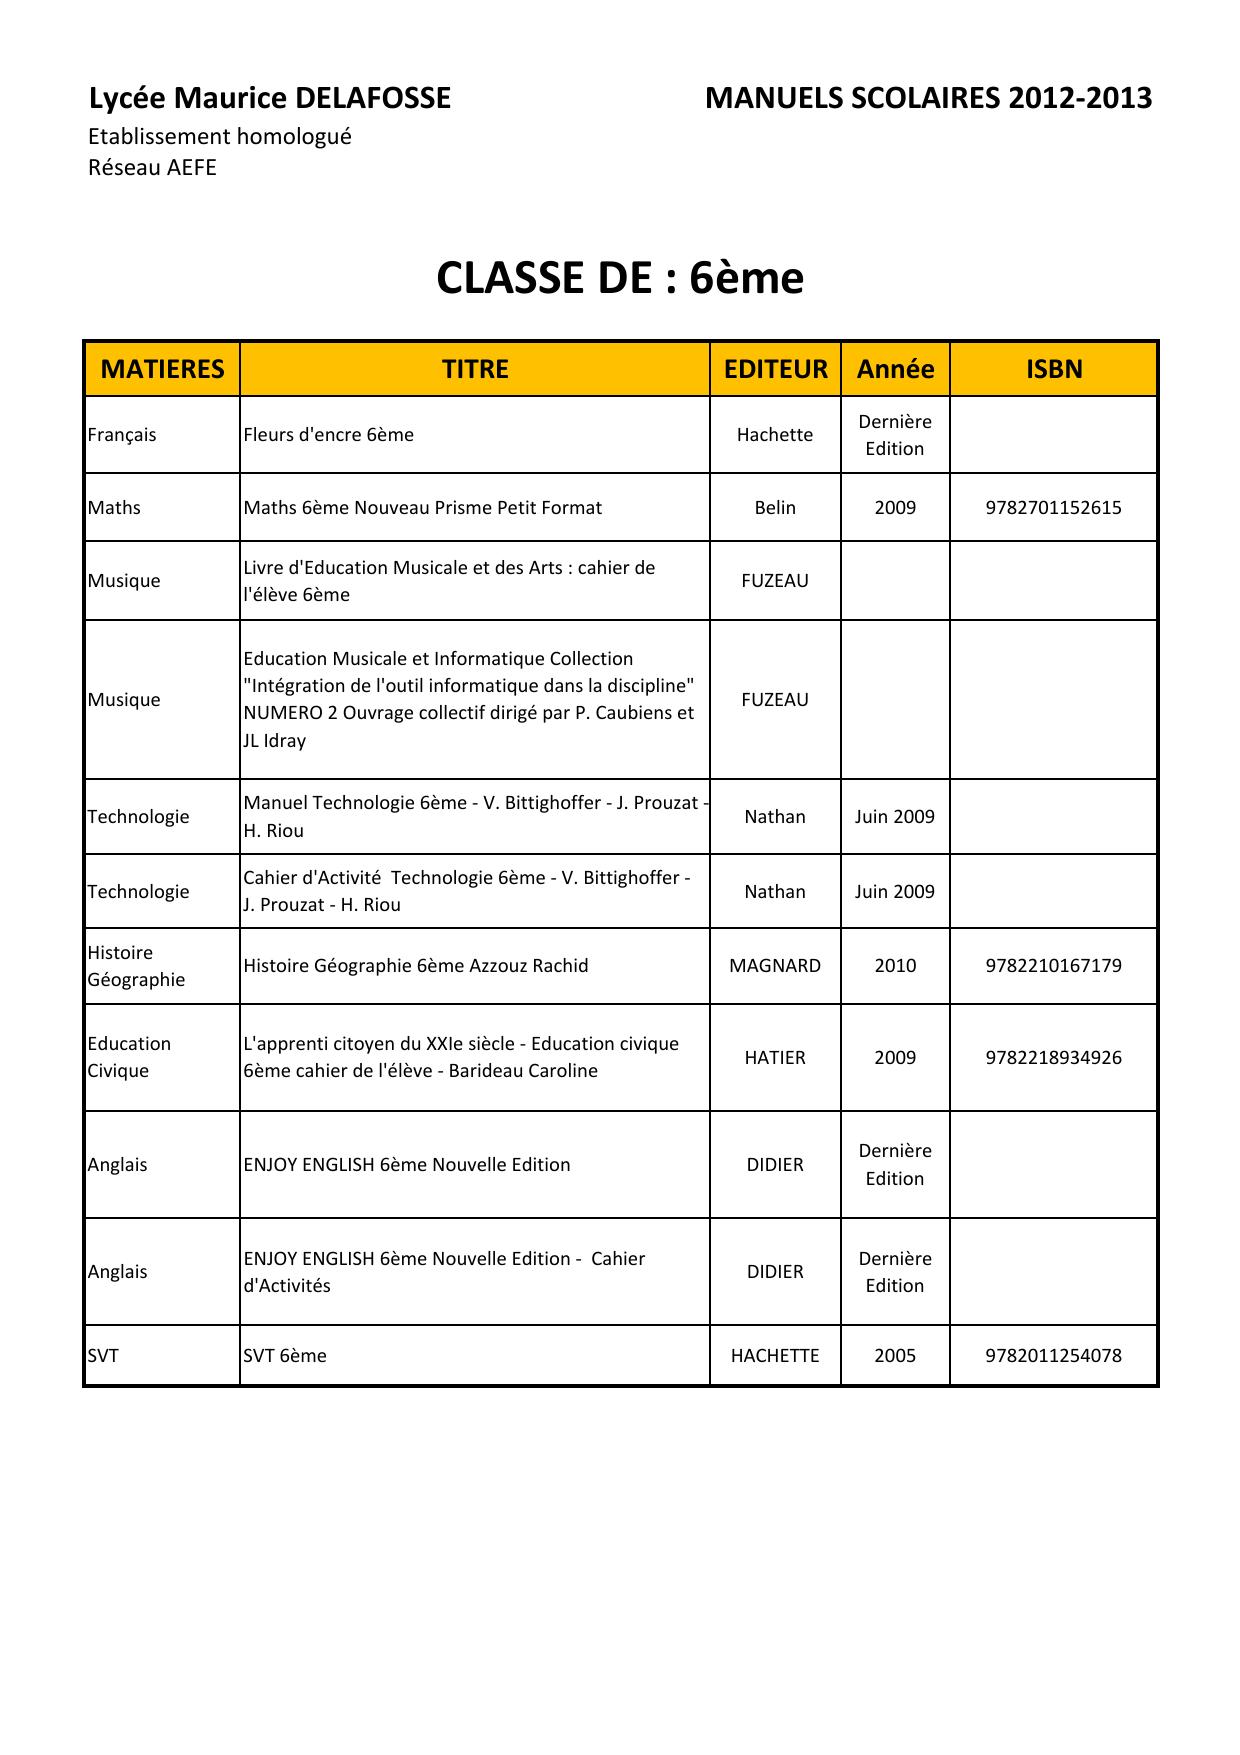 Classe De 6eme Lycee Maurice Delafosse